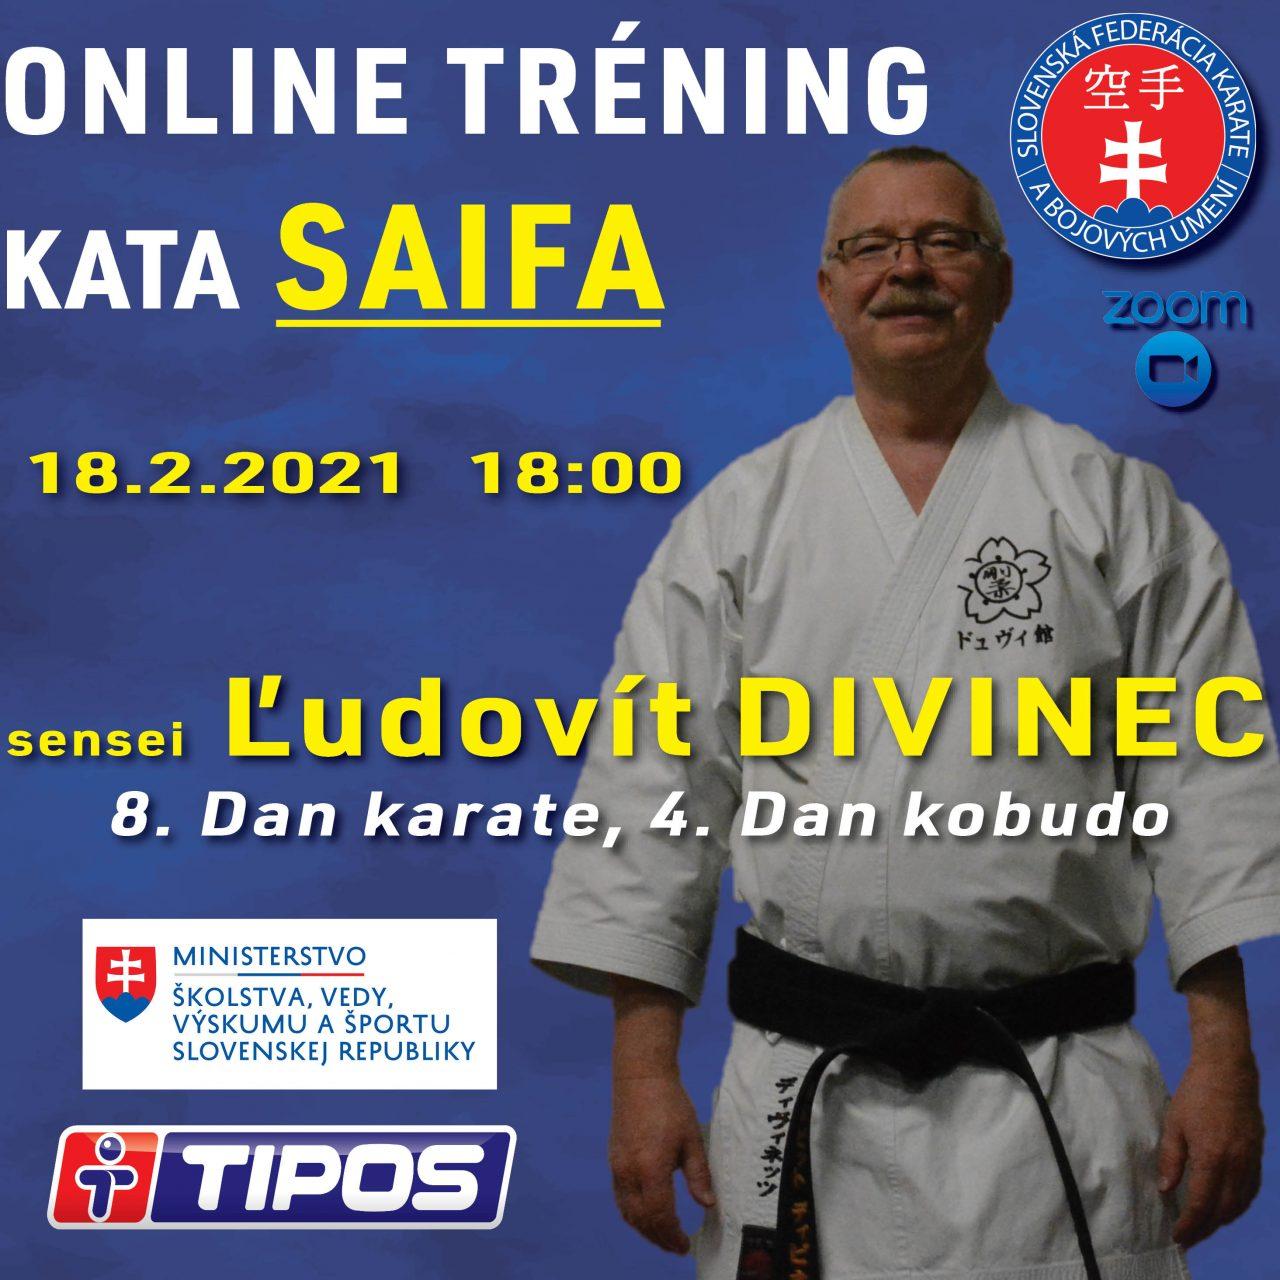 https://karate-slovakia.sk/wp-content/uploads/Duvi_Saifa-1280x1280.jpg